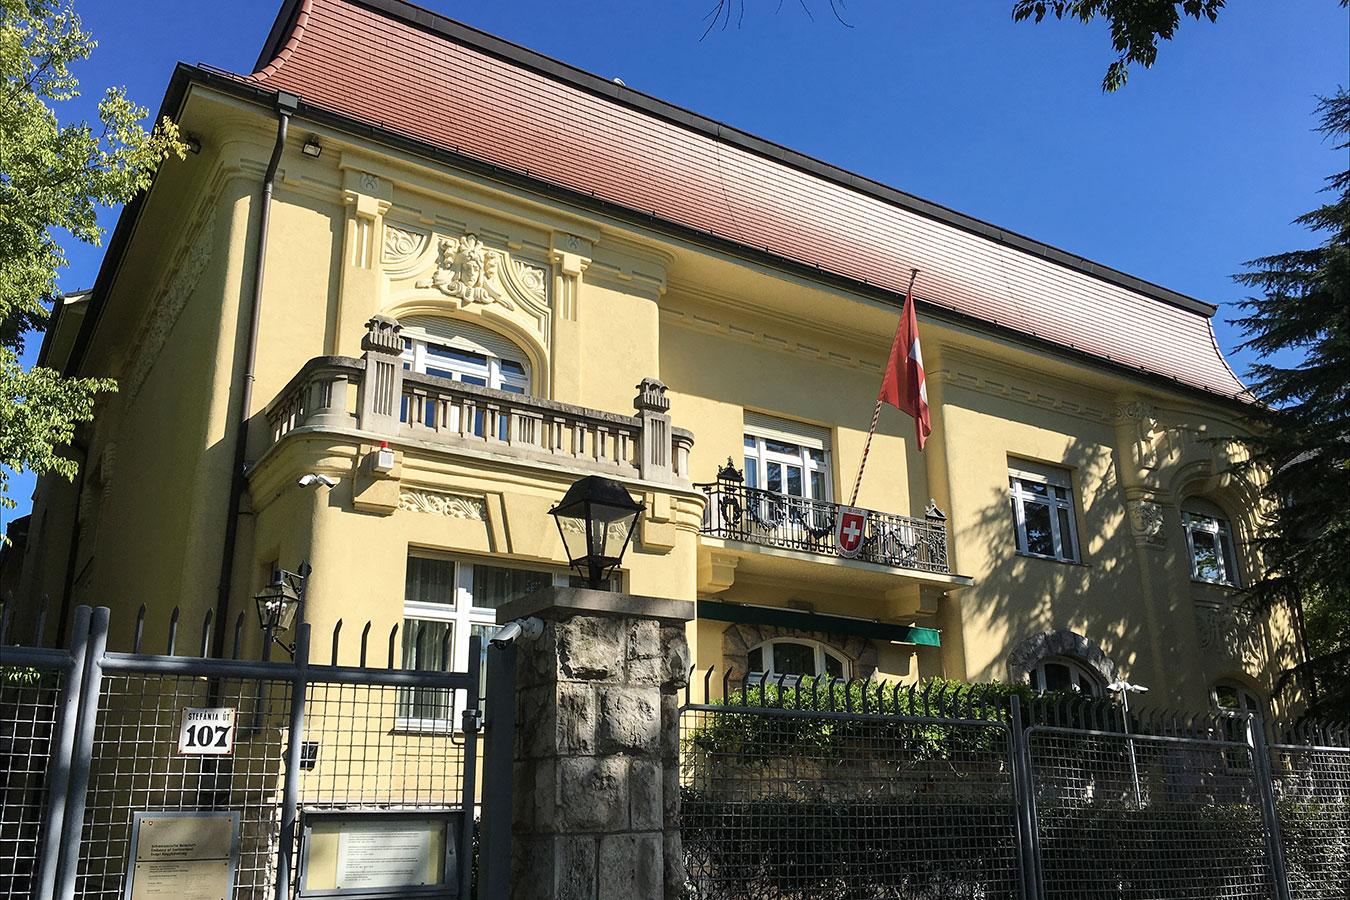 ch-hambuch-dora-szemrevalo-sehenswert-2018-embassy-switzerland-budapest.jpg